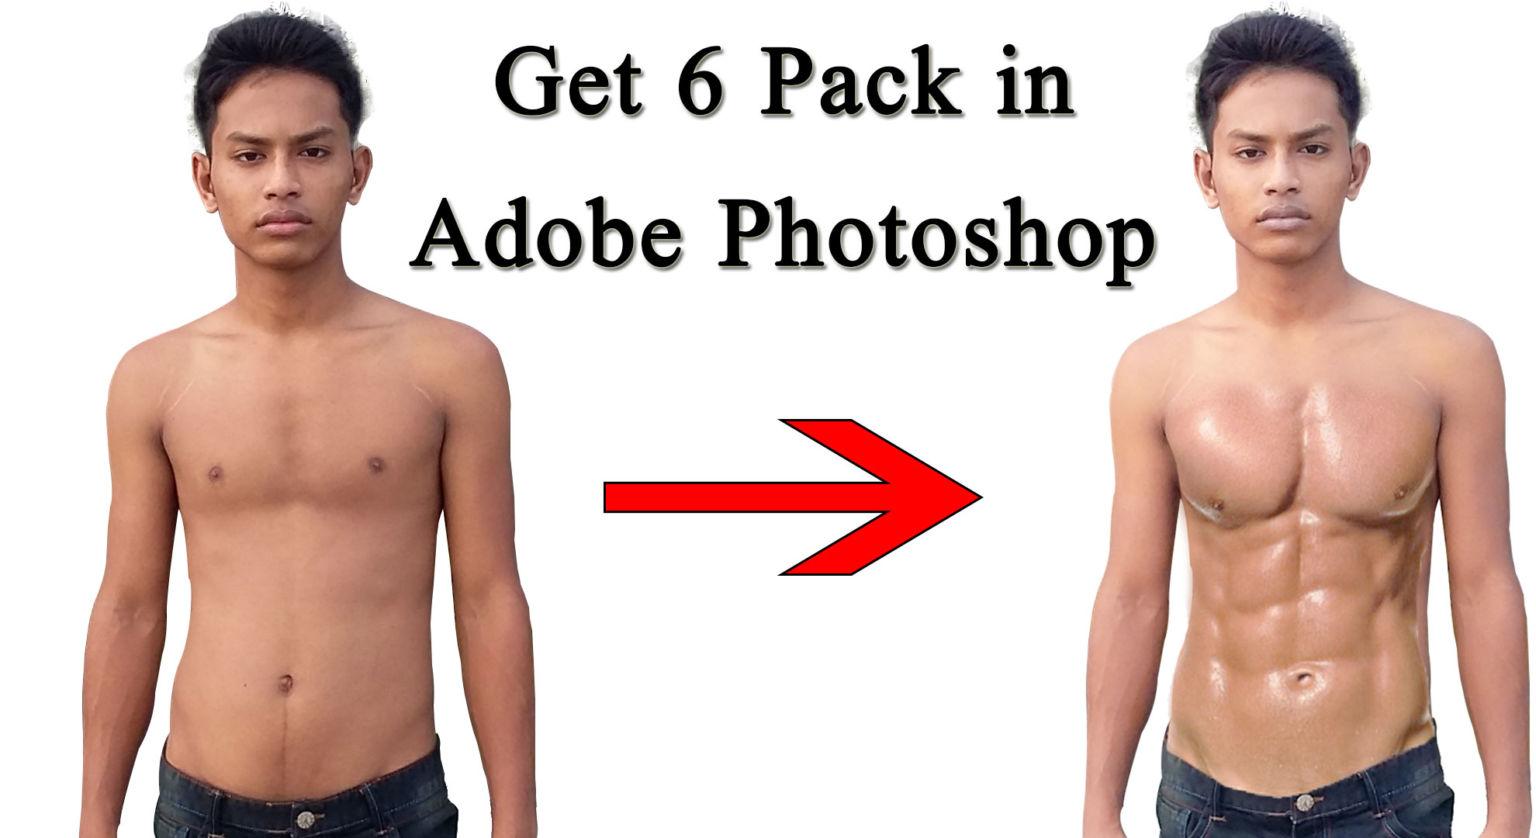 Get-6-Pack-in-Adobe-Photoshop-Tutorial